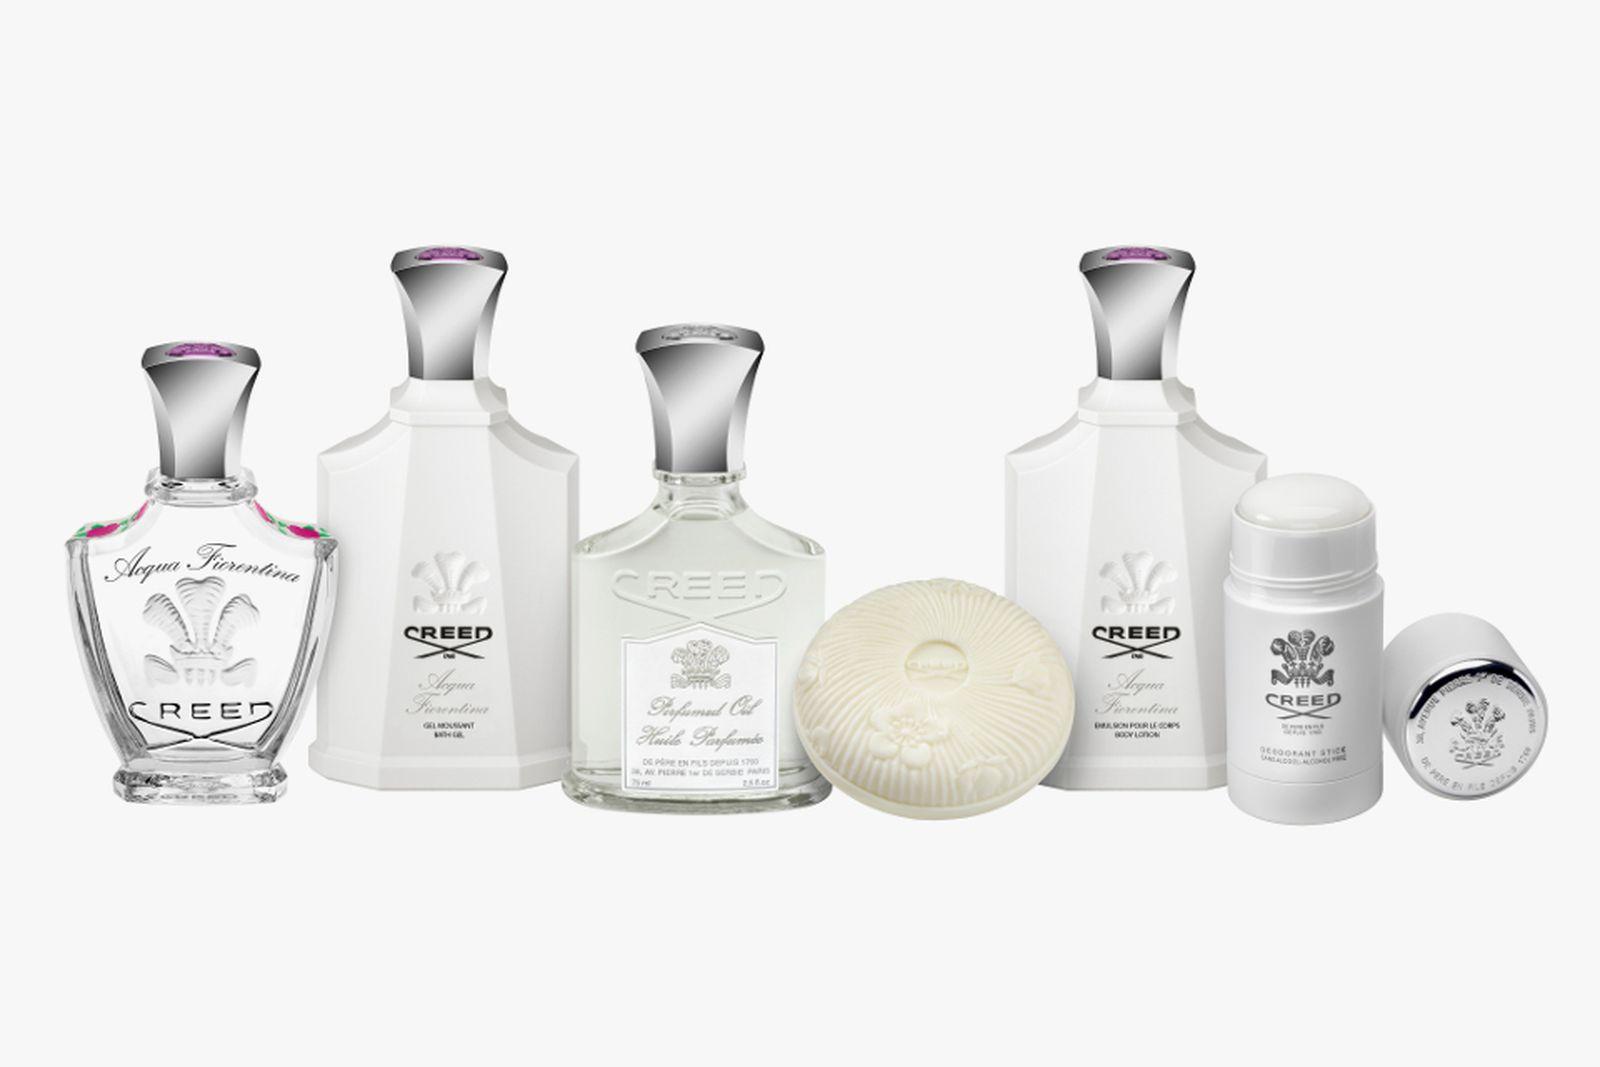 perfume brands creed Annick Goutal Arquiste CB I Hate Perfume